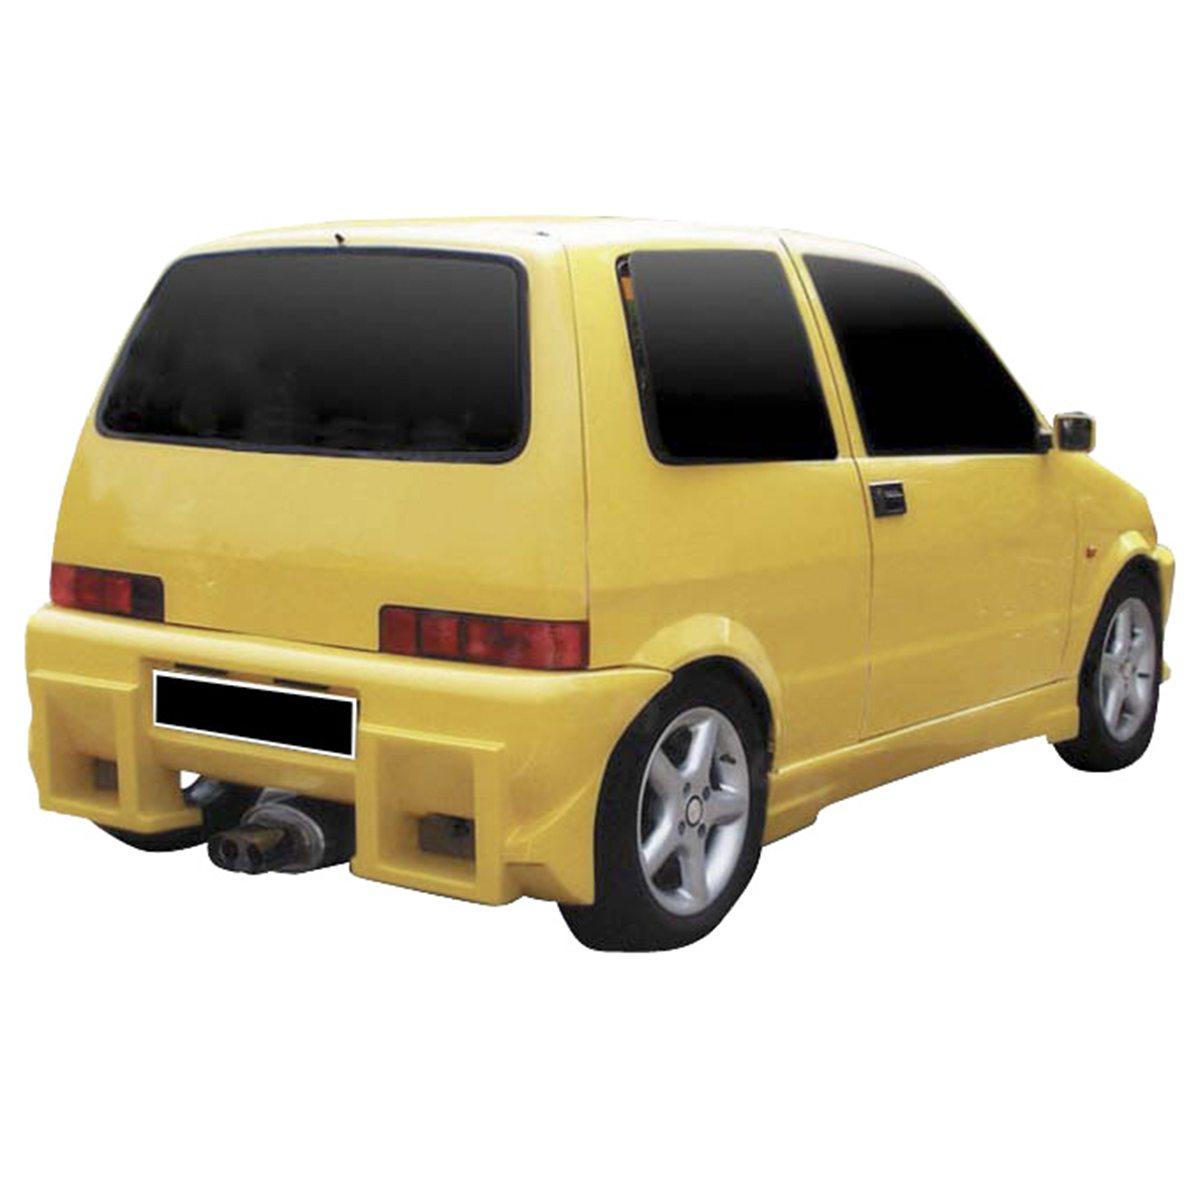 Fiat-Cinquecento-Storm-Tras-PCR011